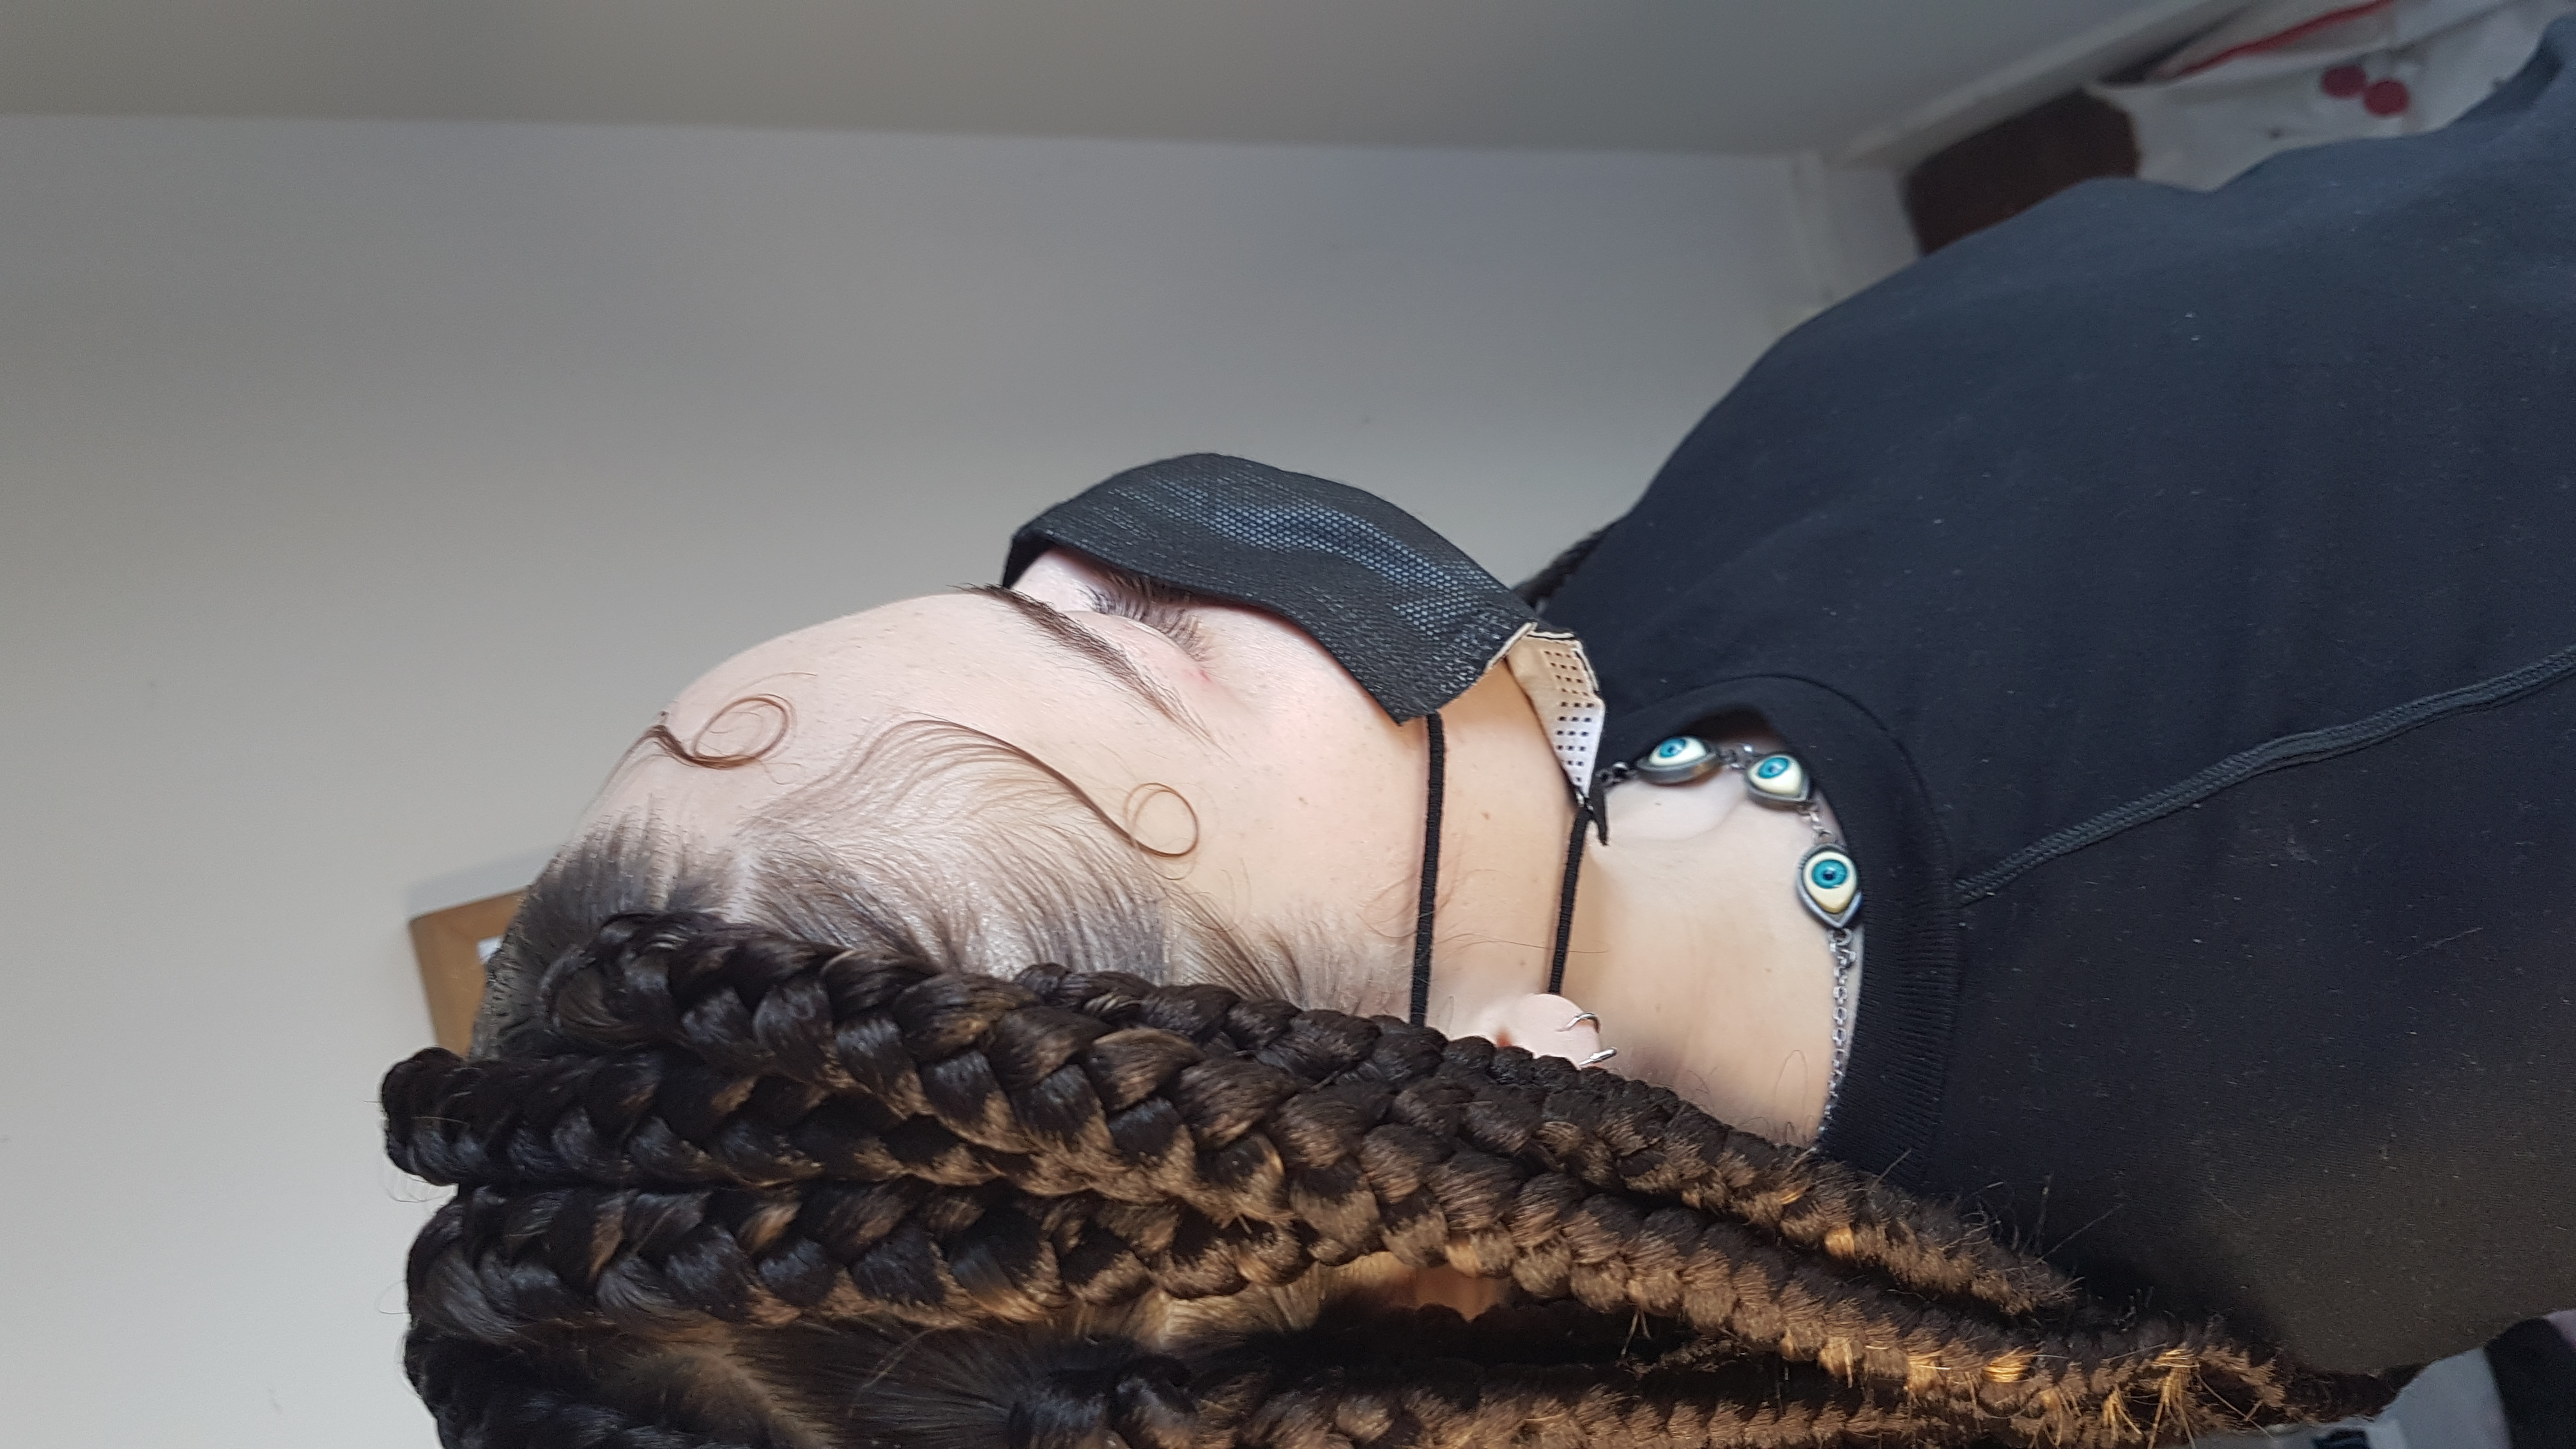 salon de coiffure afro tresse tresses box braids crochet braids vanilles tissages paris 75 77 78 91 92 93 94 95 GHEOWSBQ